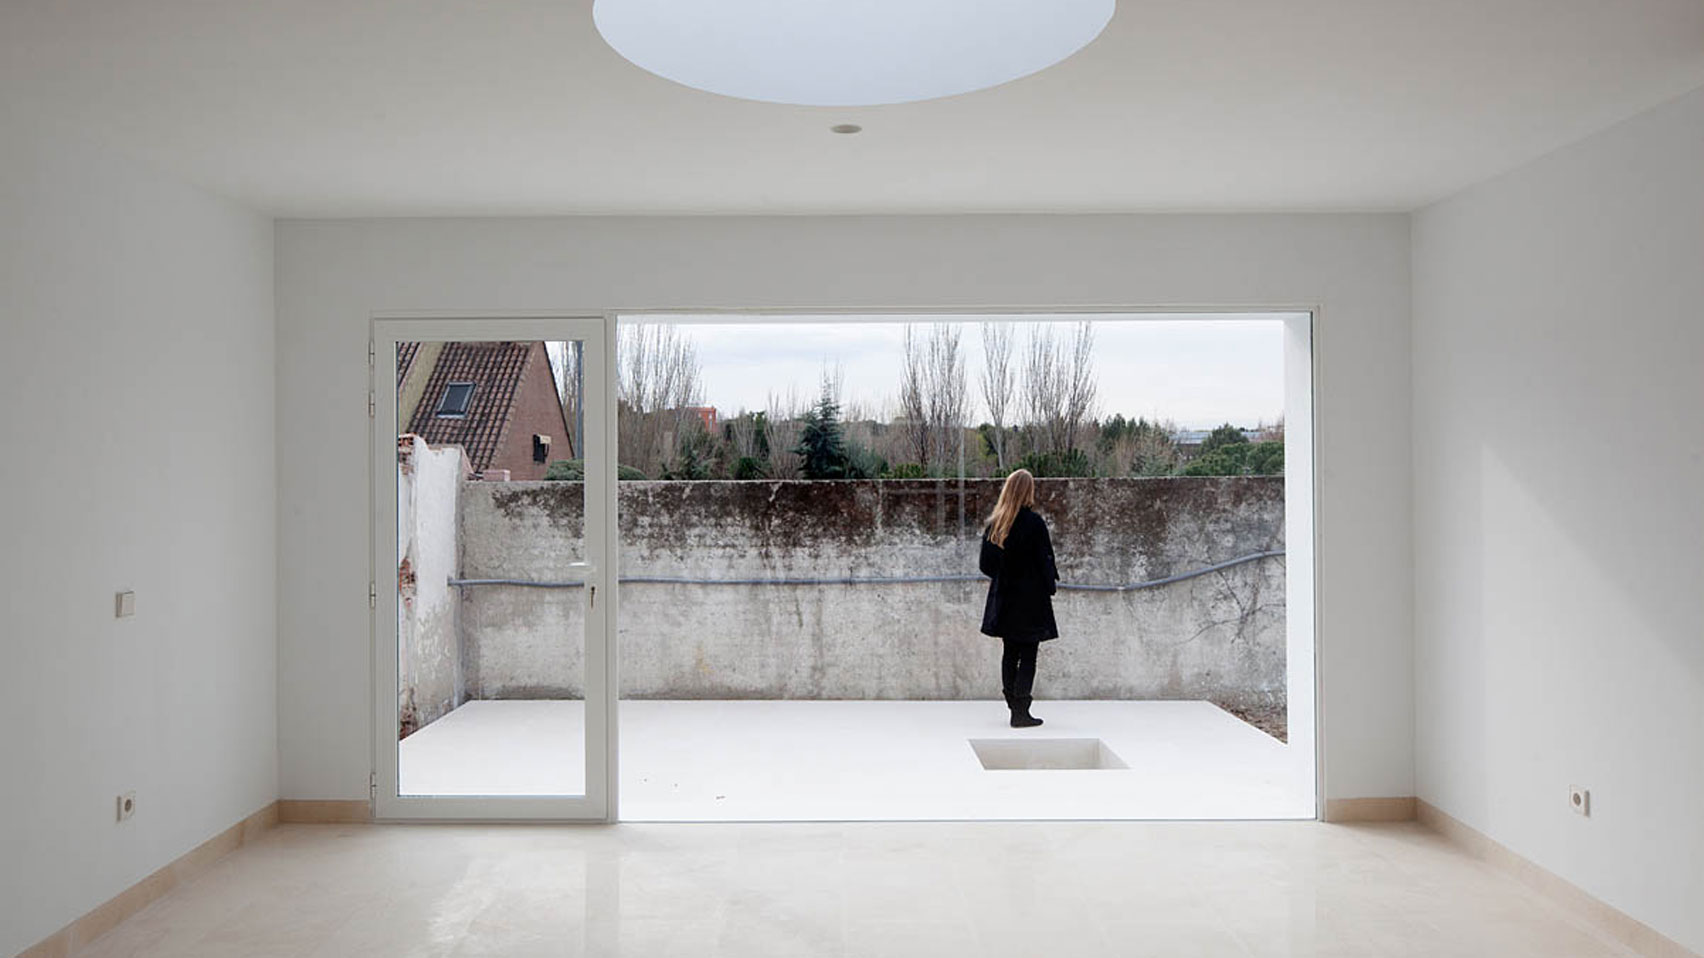 Little White Box at Turégano House by Alberto Campo Baeza